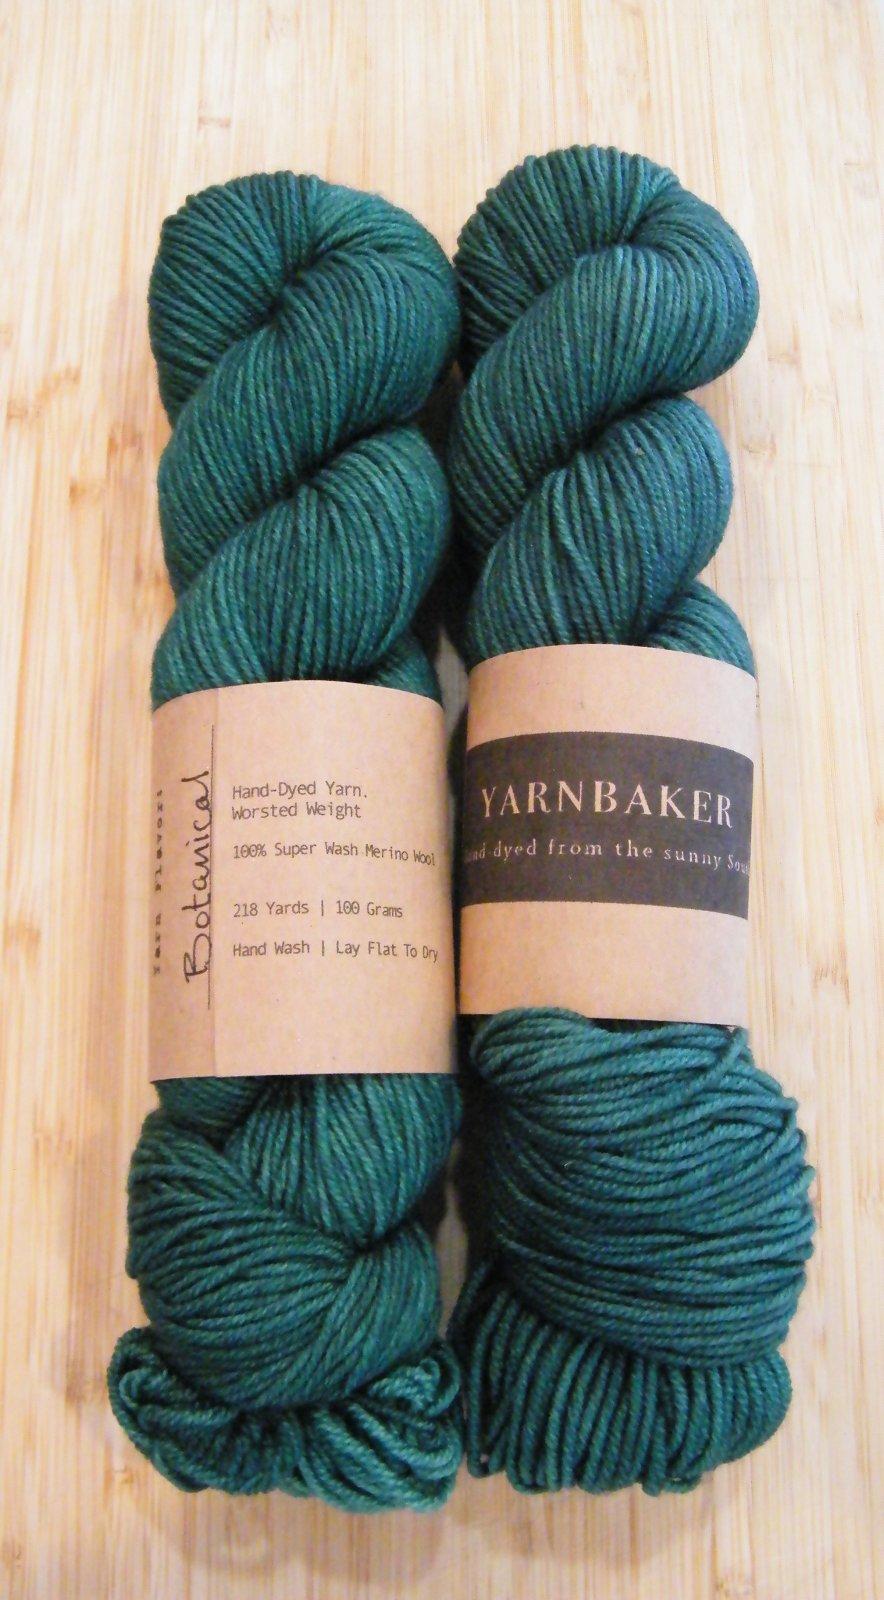 Yarnbaker Hand-Dyed Worsted Wool Yarn